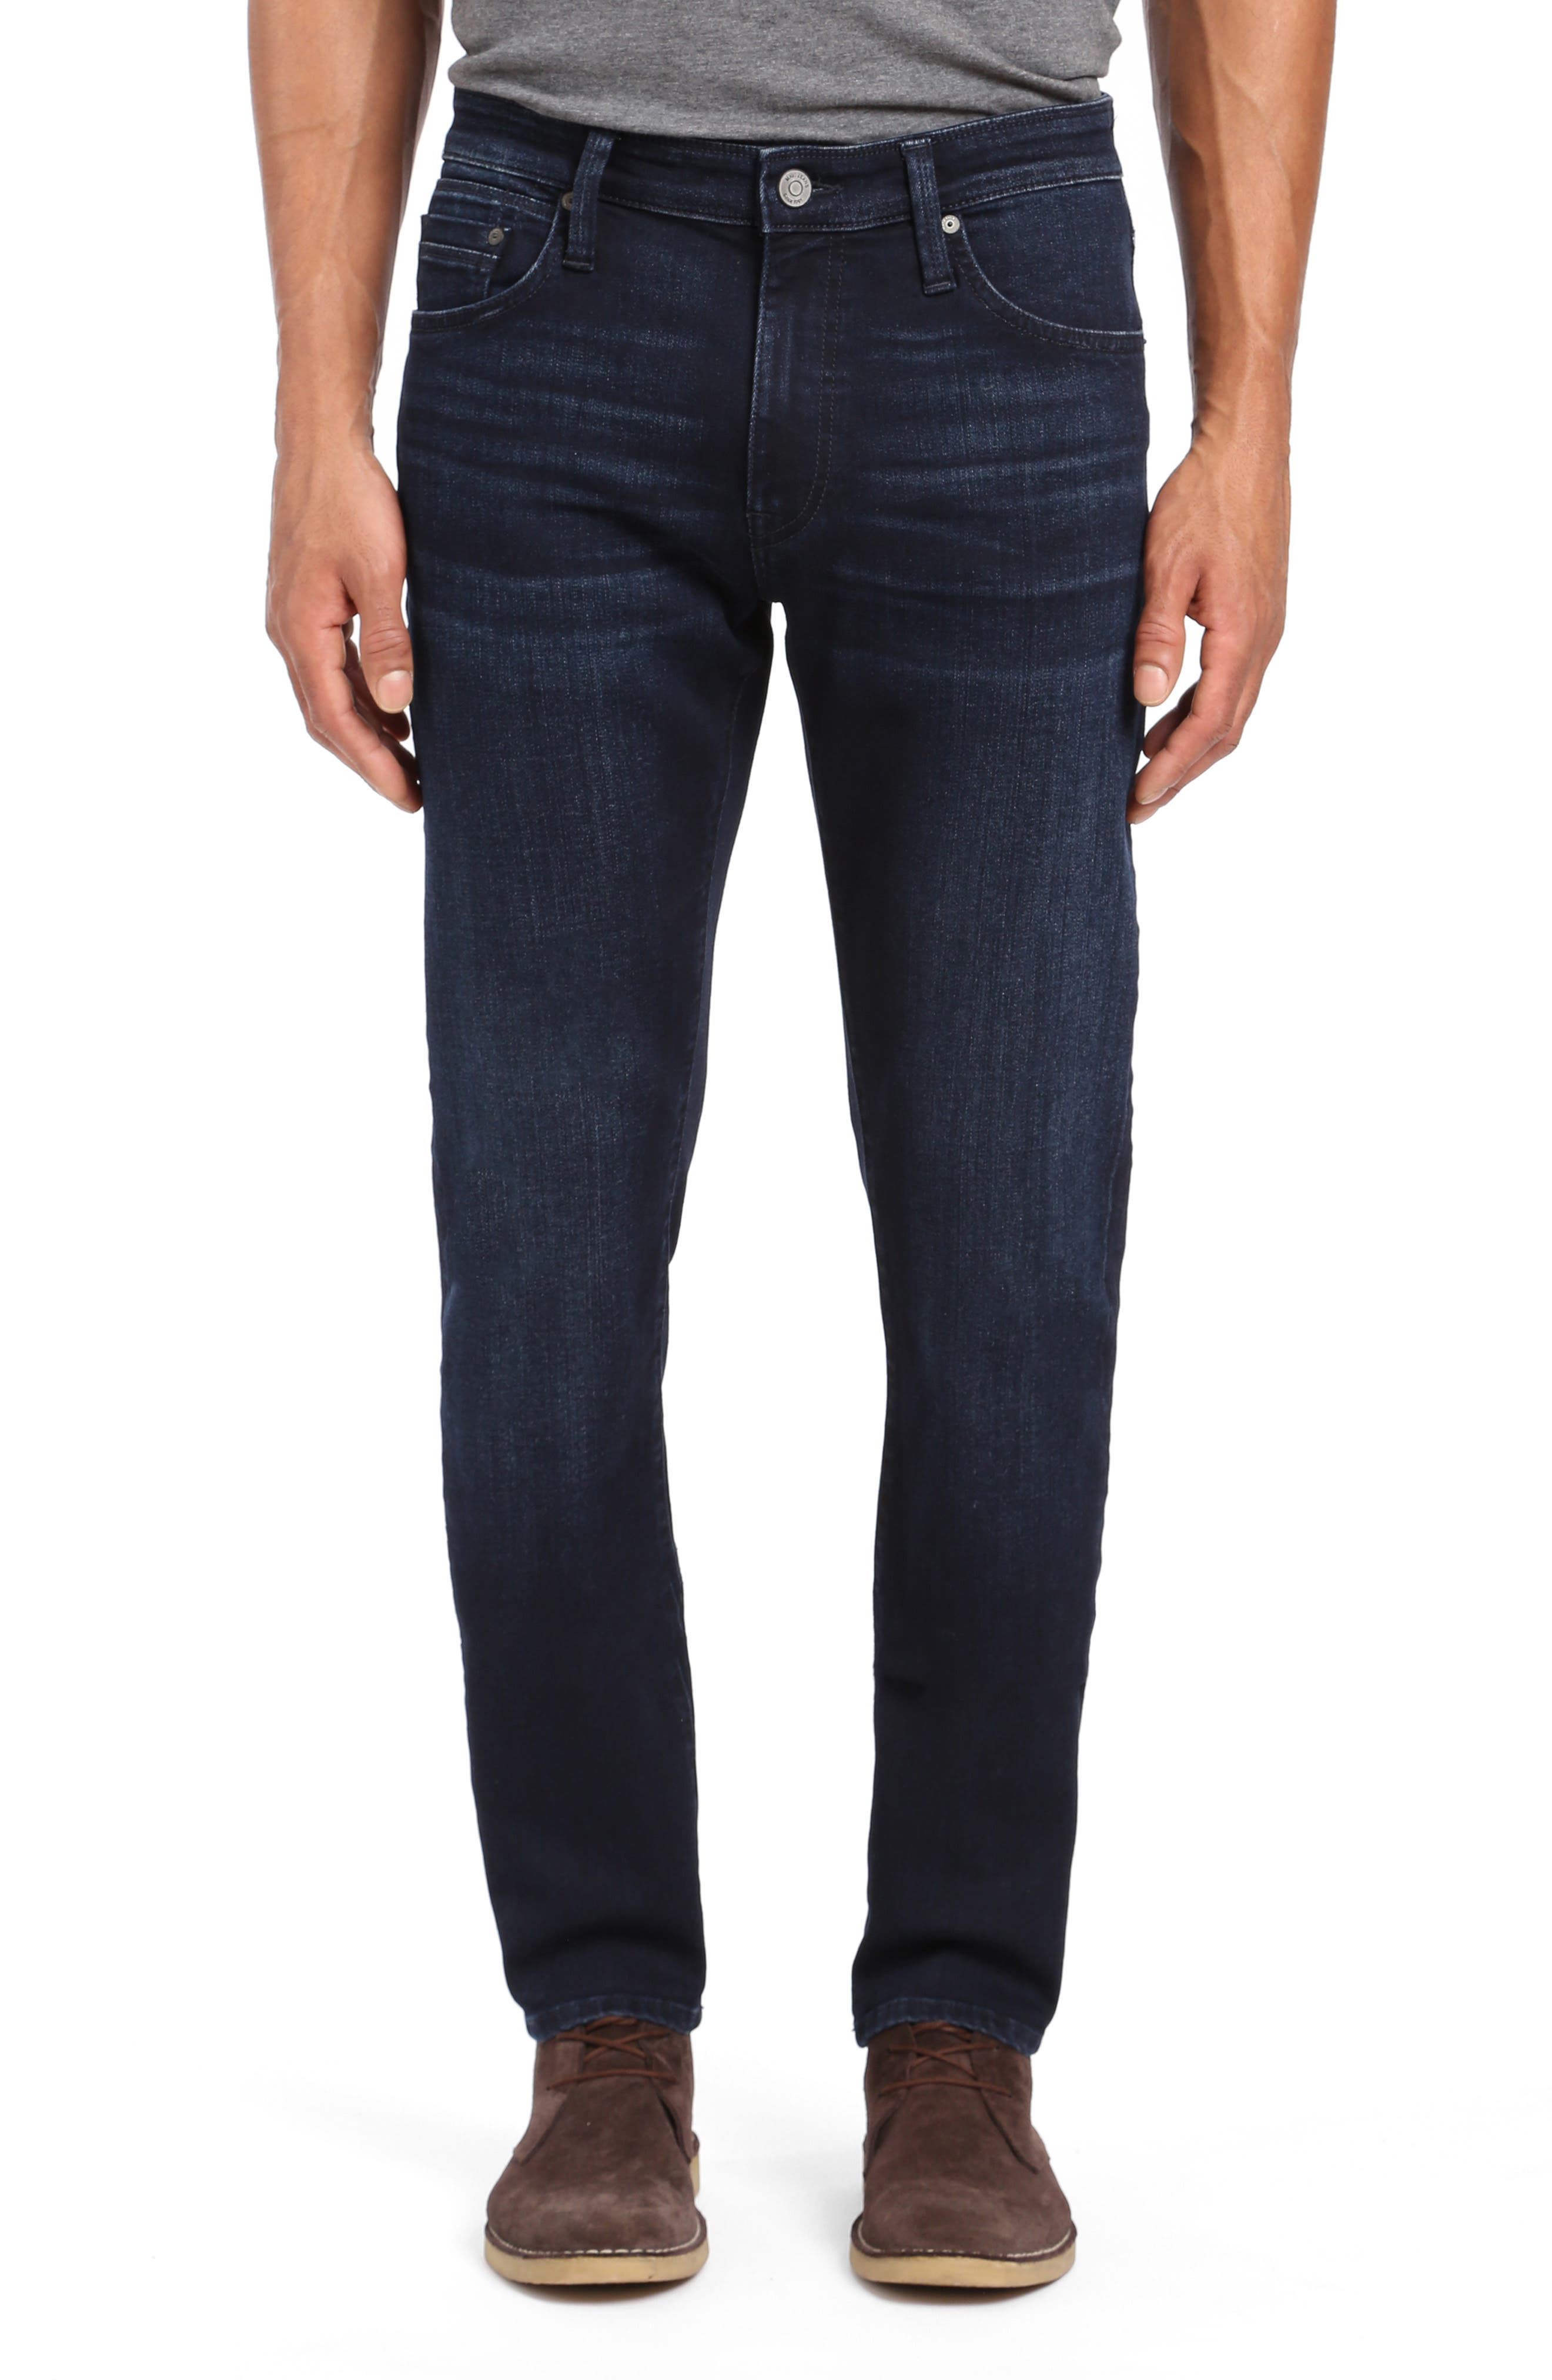 Jake Skinny Fit Jeans,                         Main,                         color, INK FOGGY WILLIAMSBURG